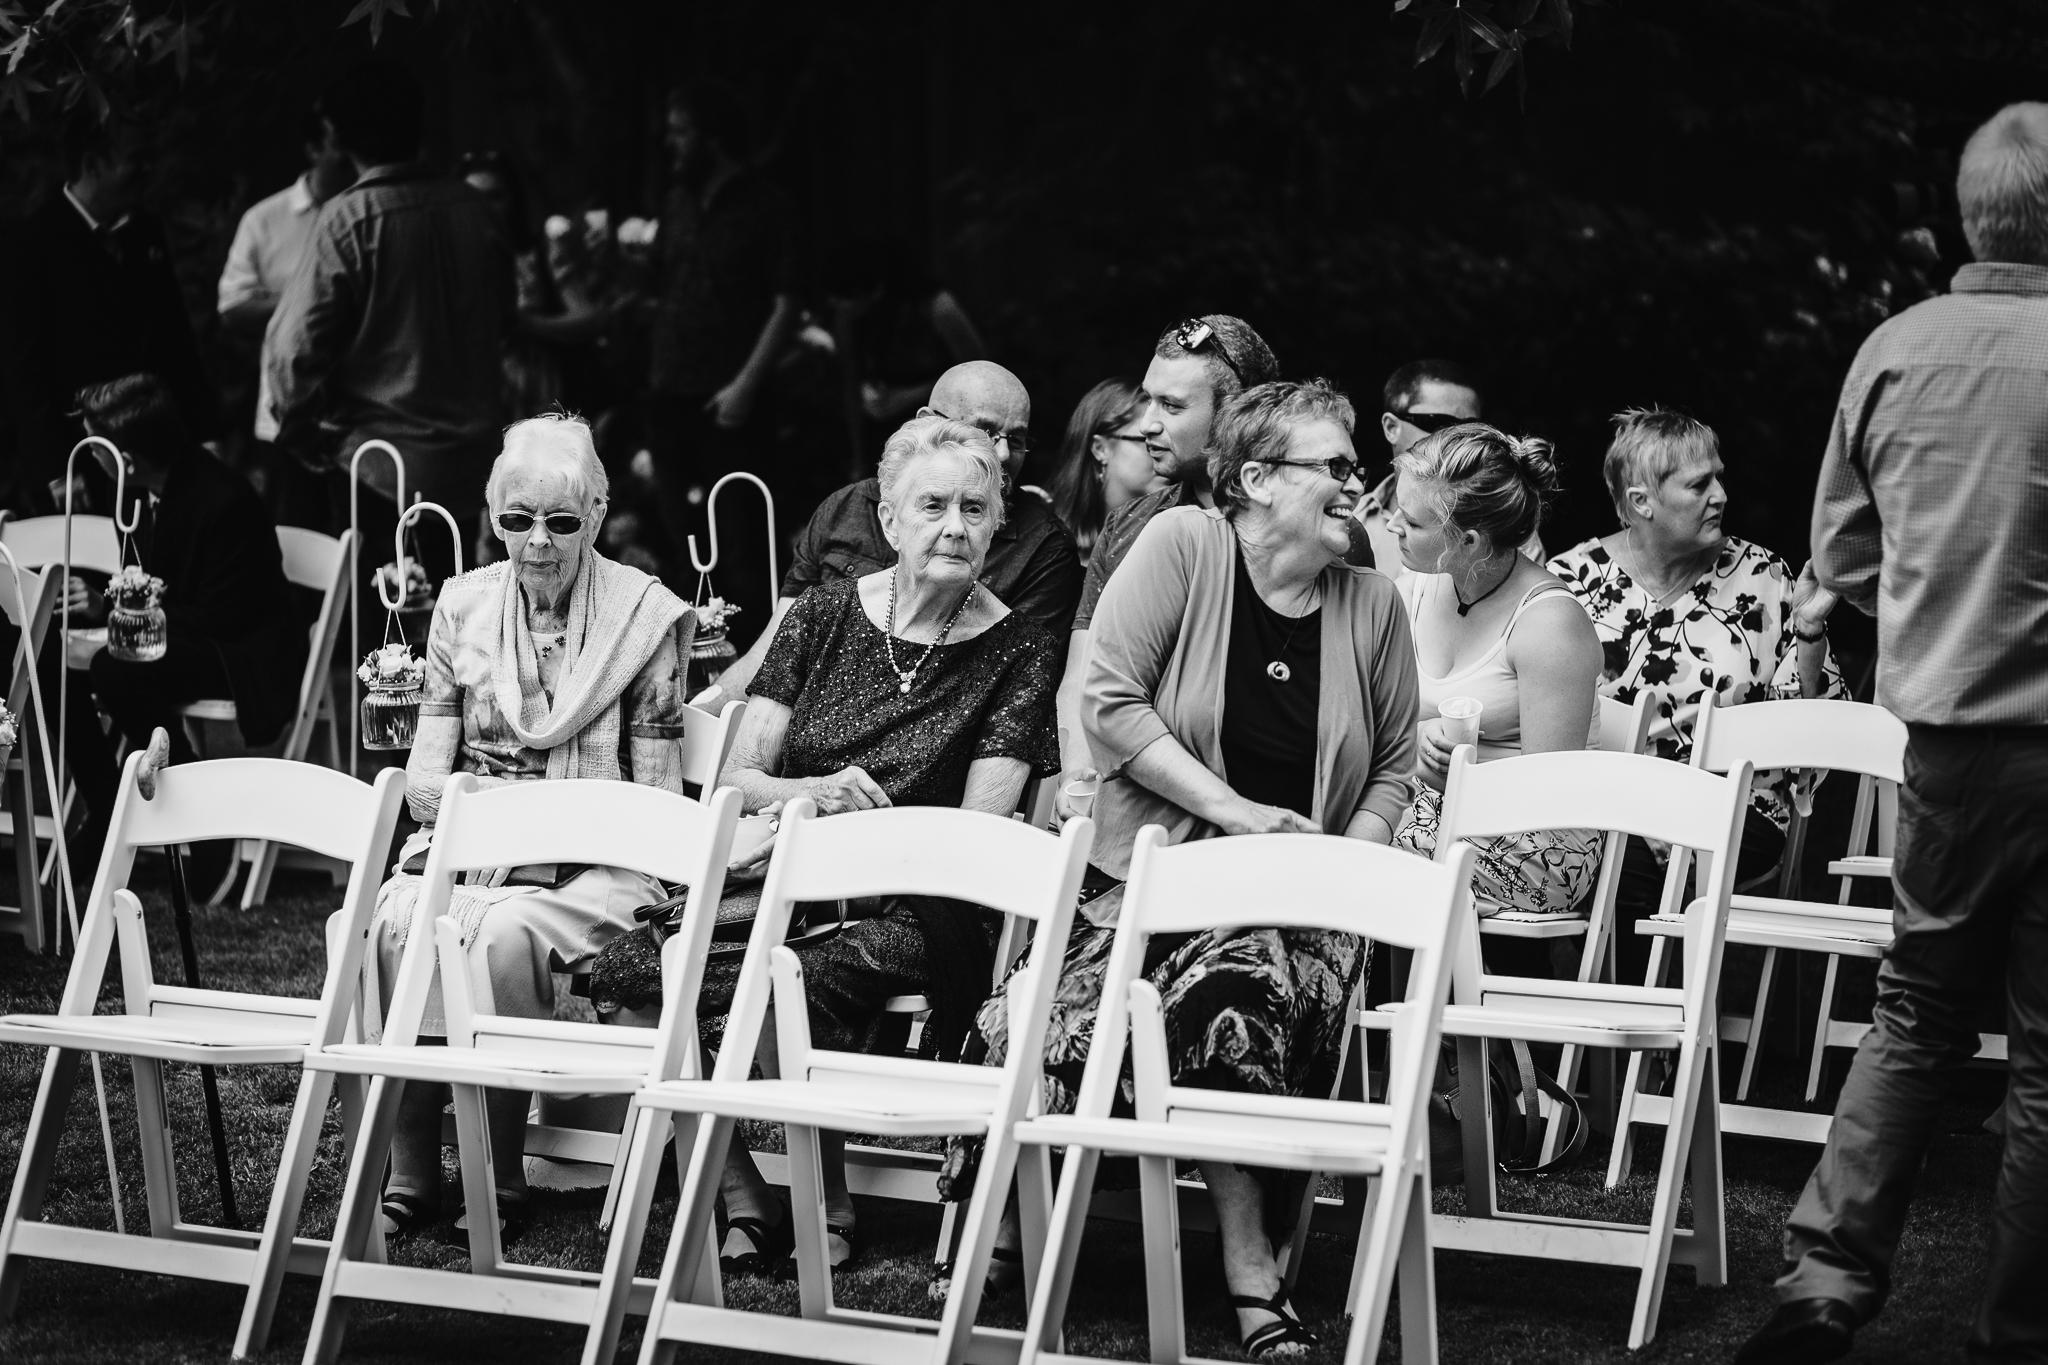 Tauranga-Coromandel-Elegant-Wedding-Photographer-Charlemagne-Lodge-58.jpg